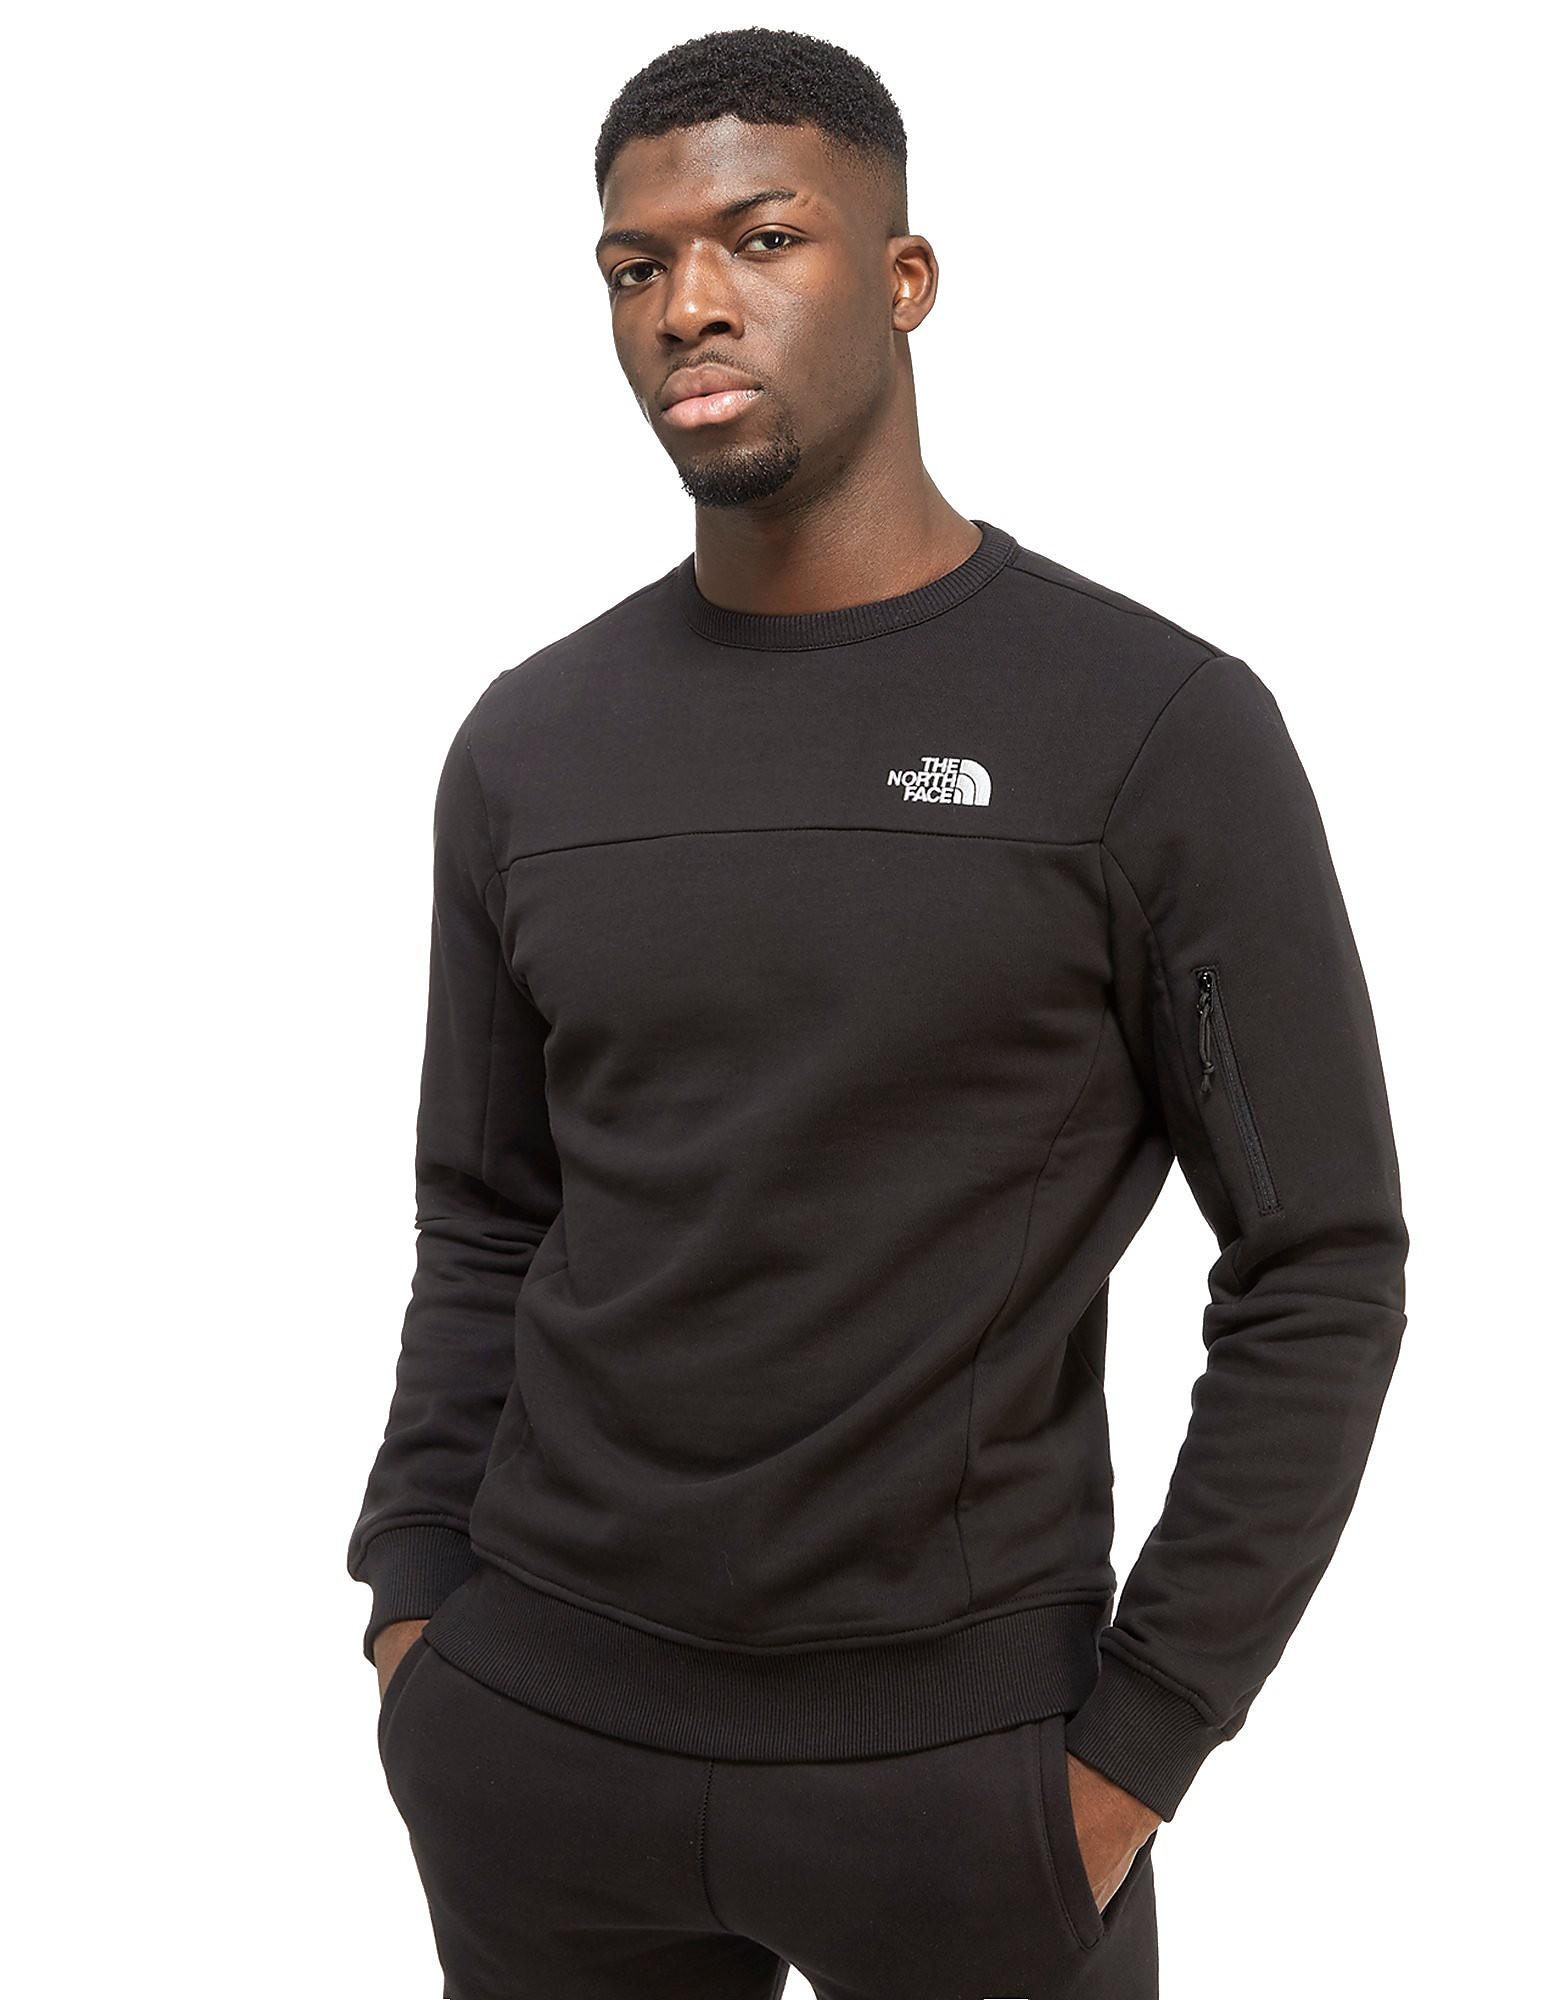 The North Face Z Pocket Crew Sweatshirt